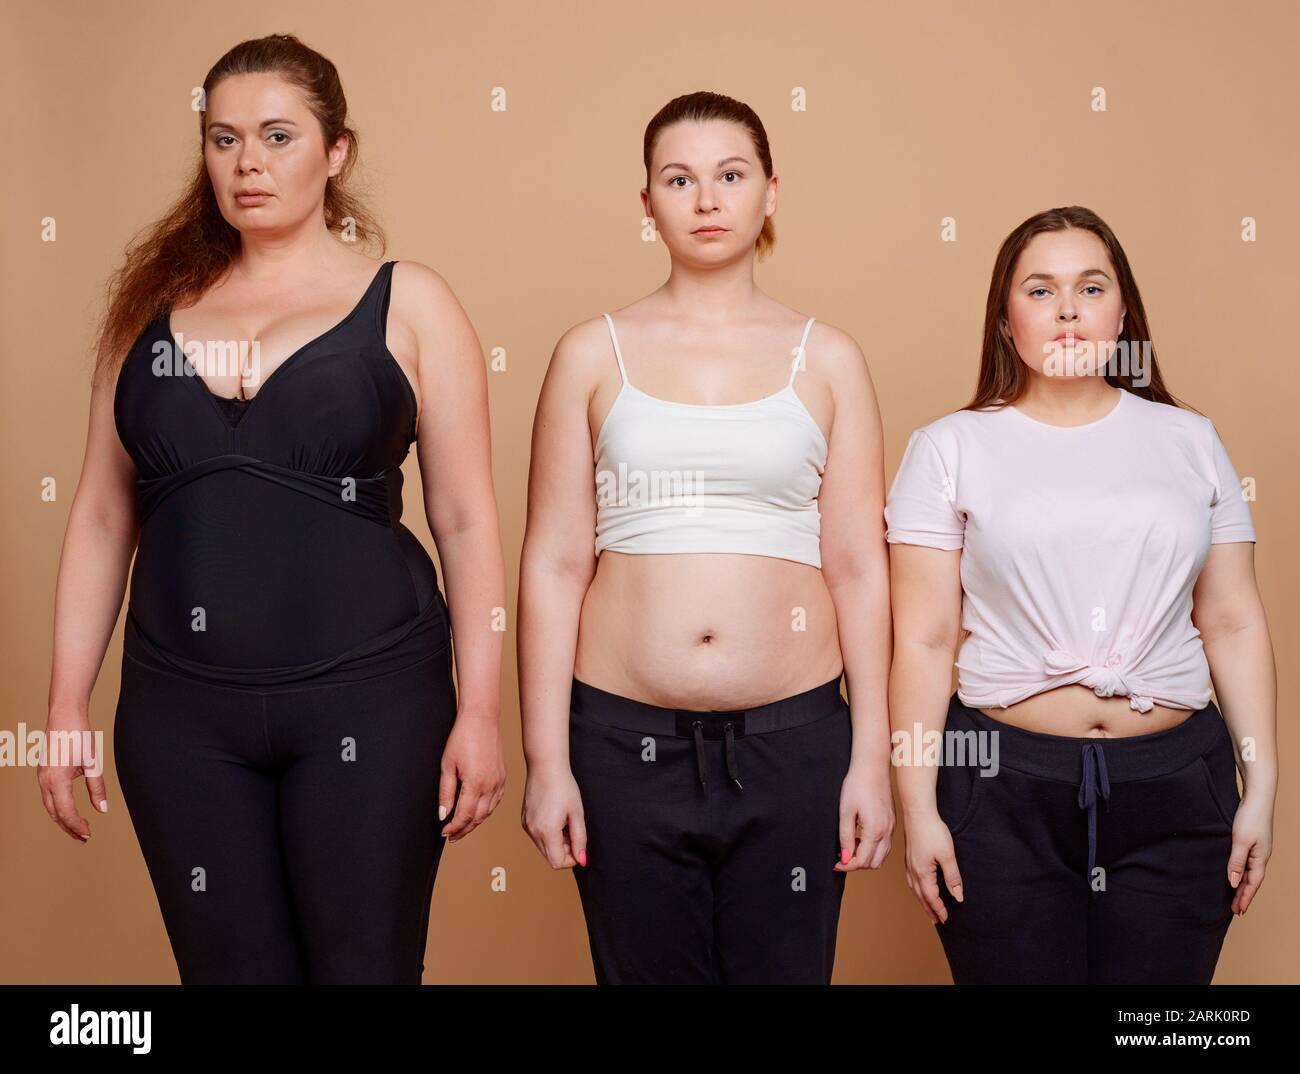 Fat women tall 5 Reasons